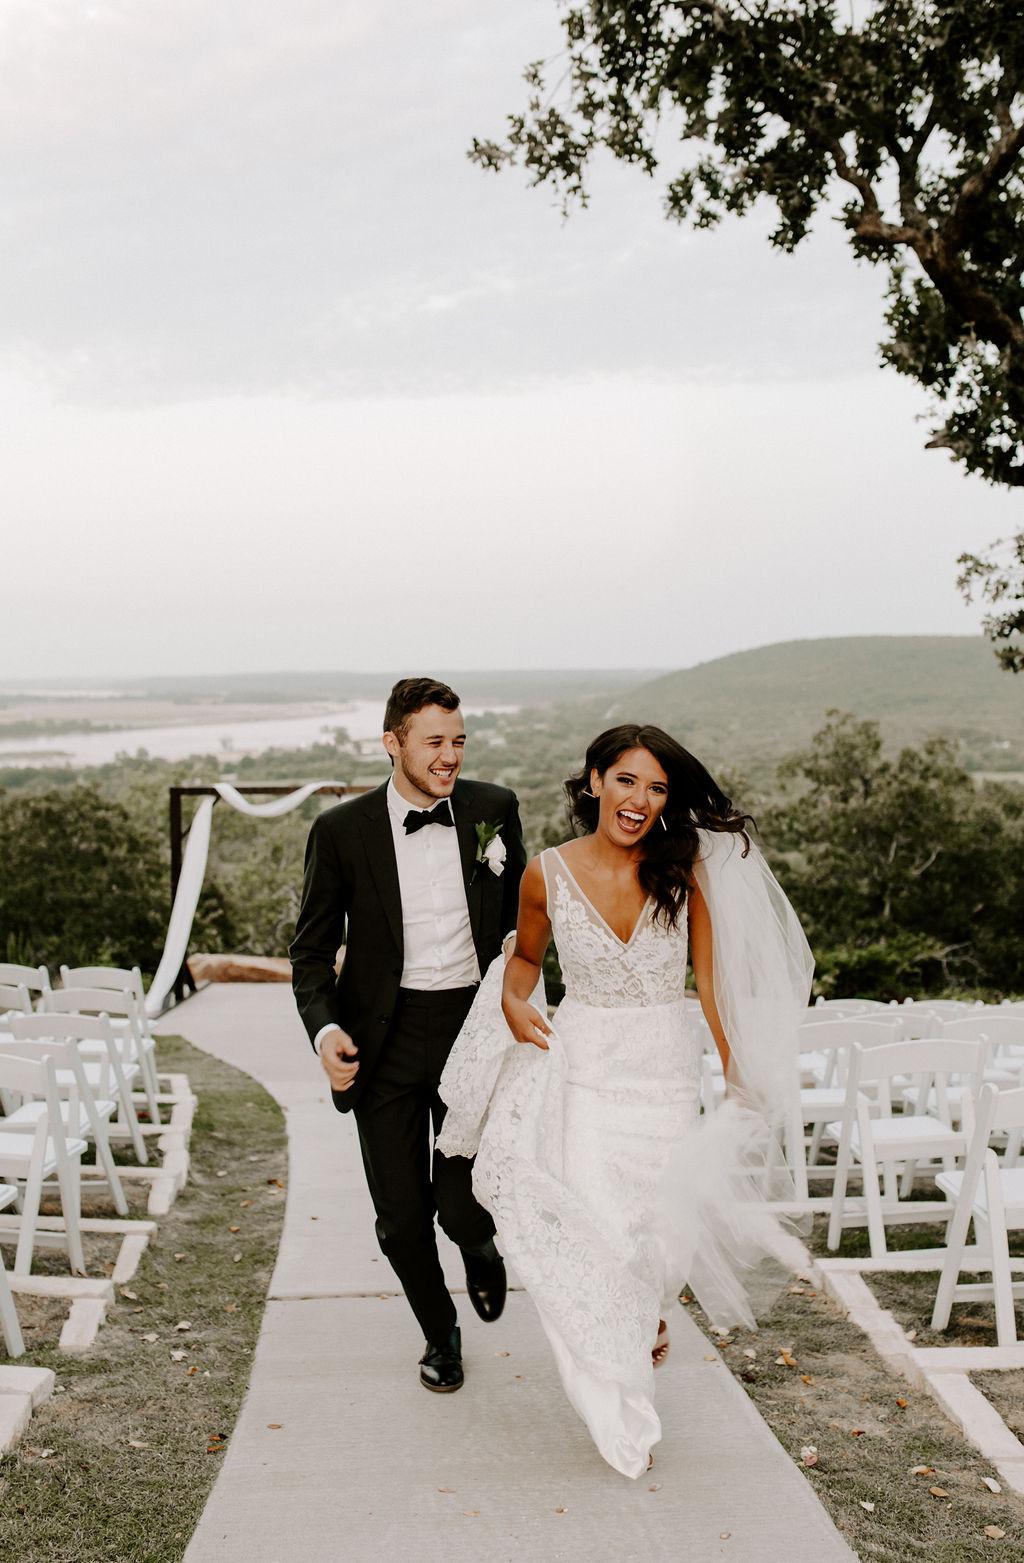 Tulsa White Barn Wedding Venue Outdoor Ceremony 120.jpg